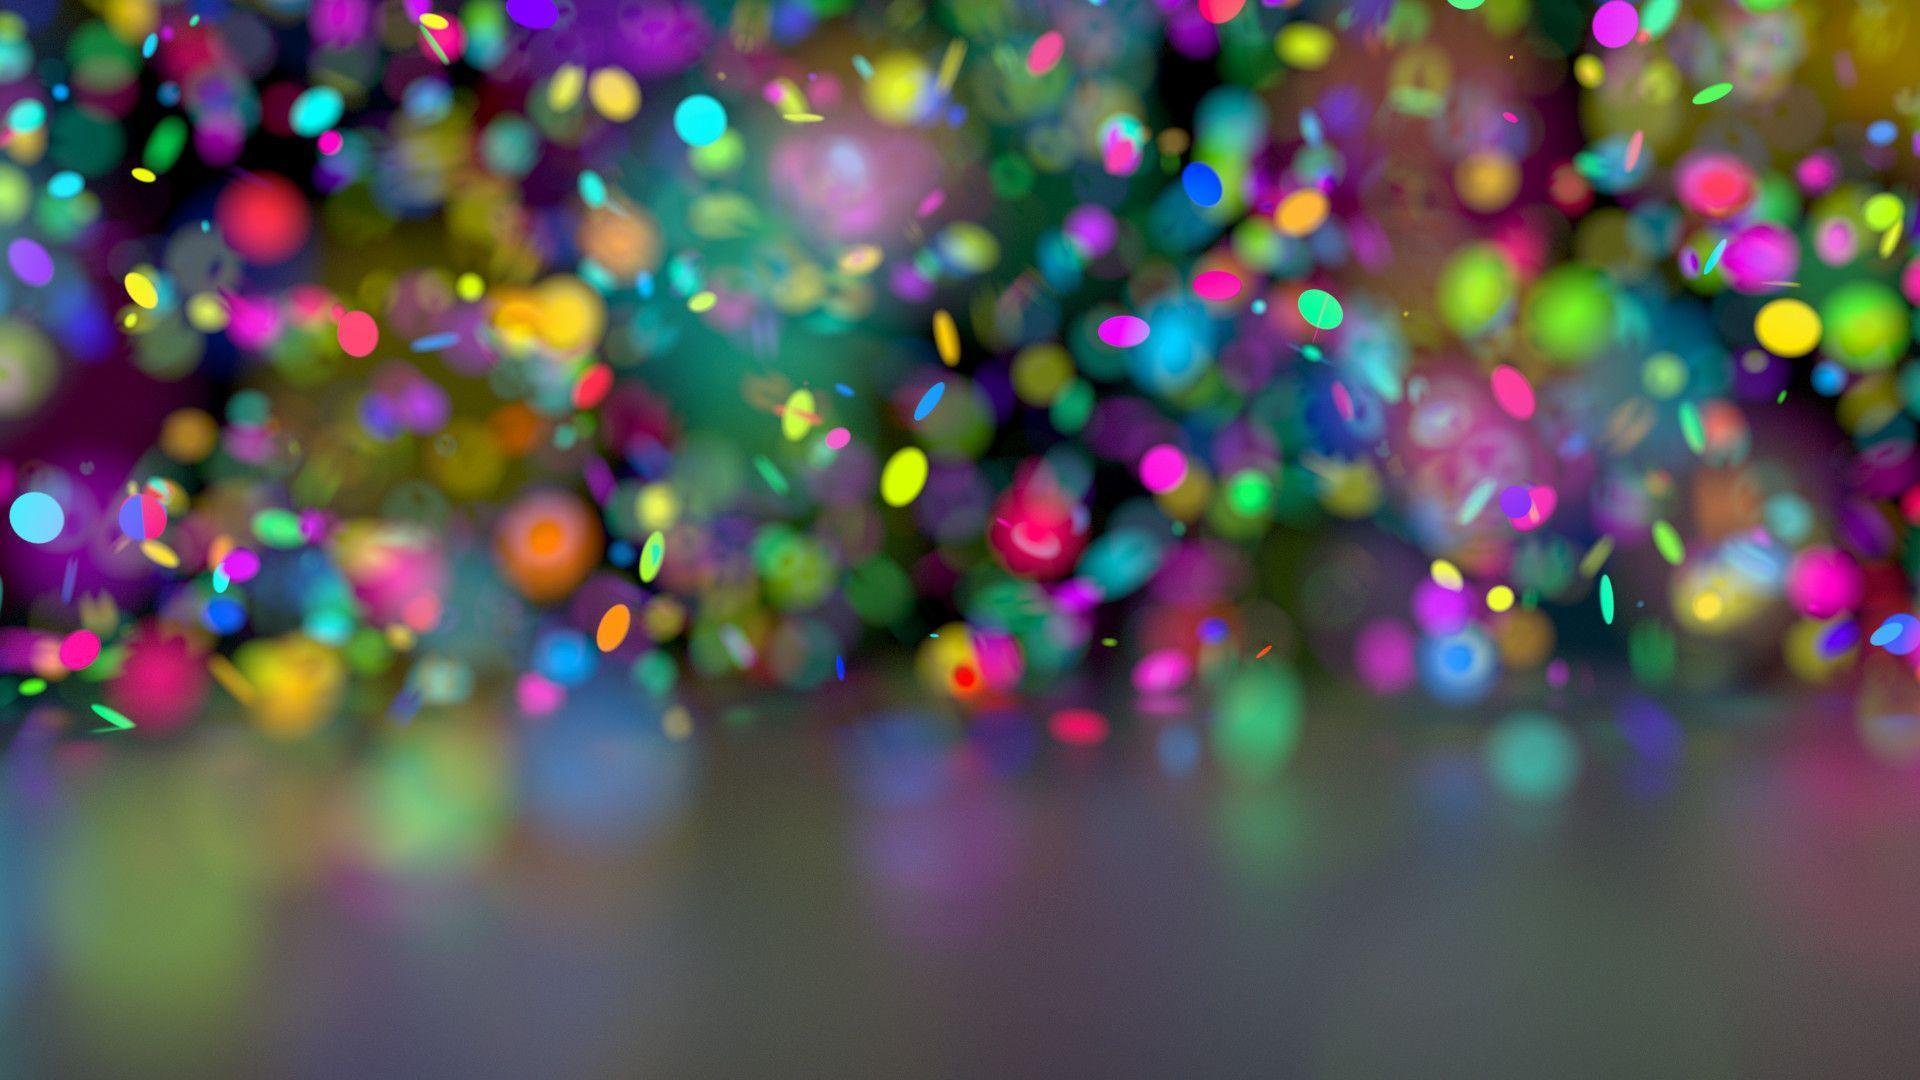 Confetti Wallpapers Top Free Confetti Backgrounds